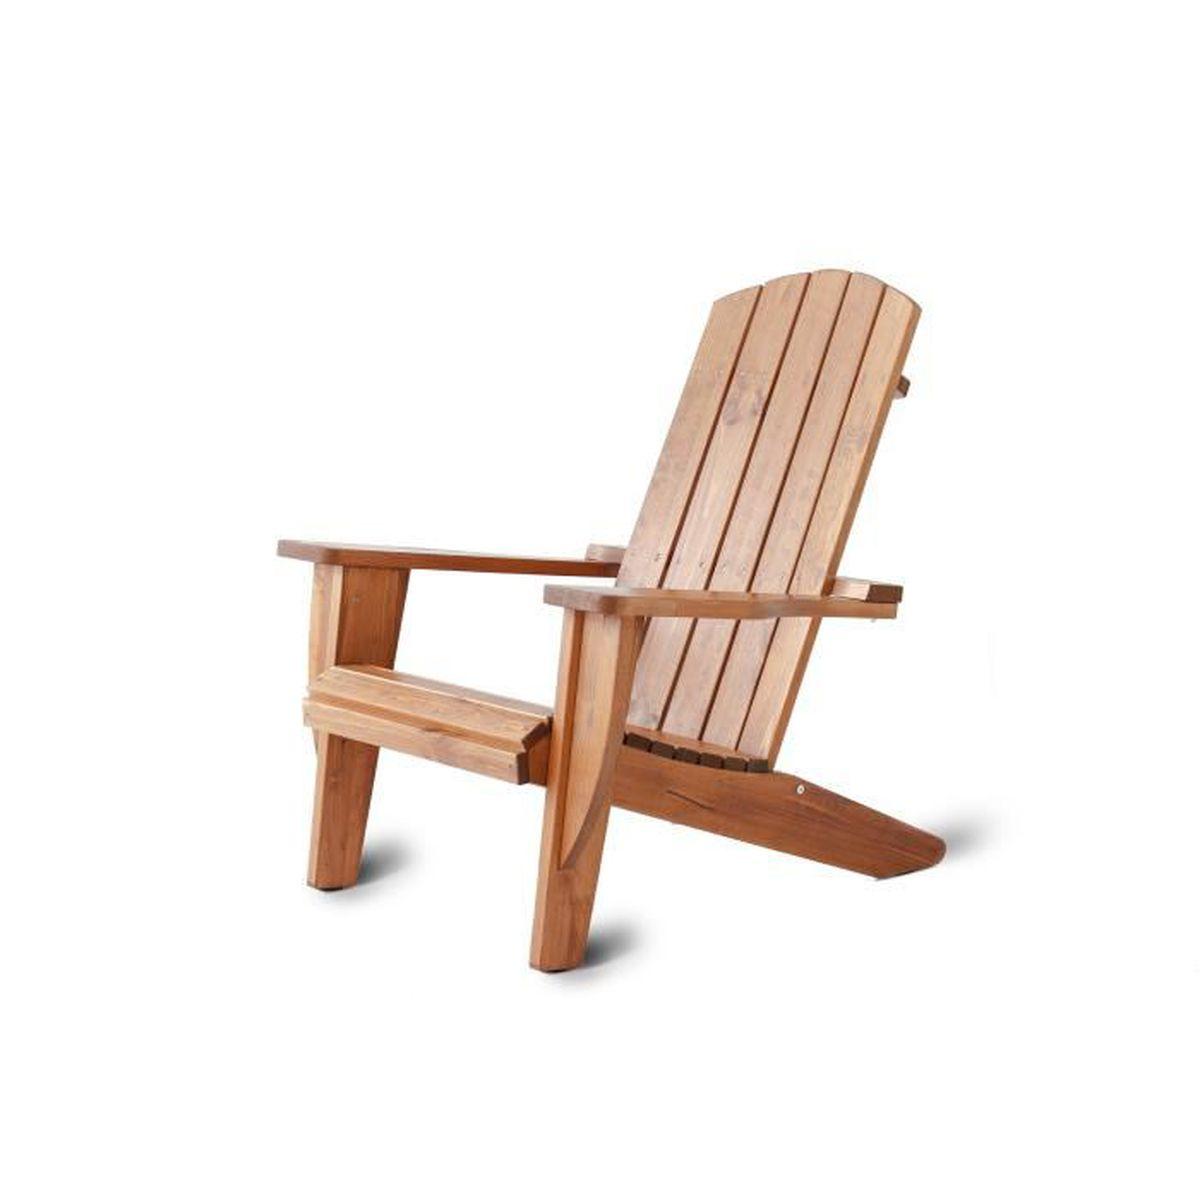 Coussin Pour Fauteuil Adirondack fauteuil de jardin adirondack ottawa en pin massif, ton